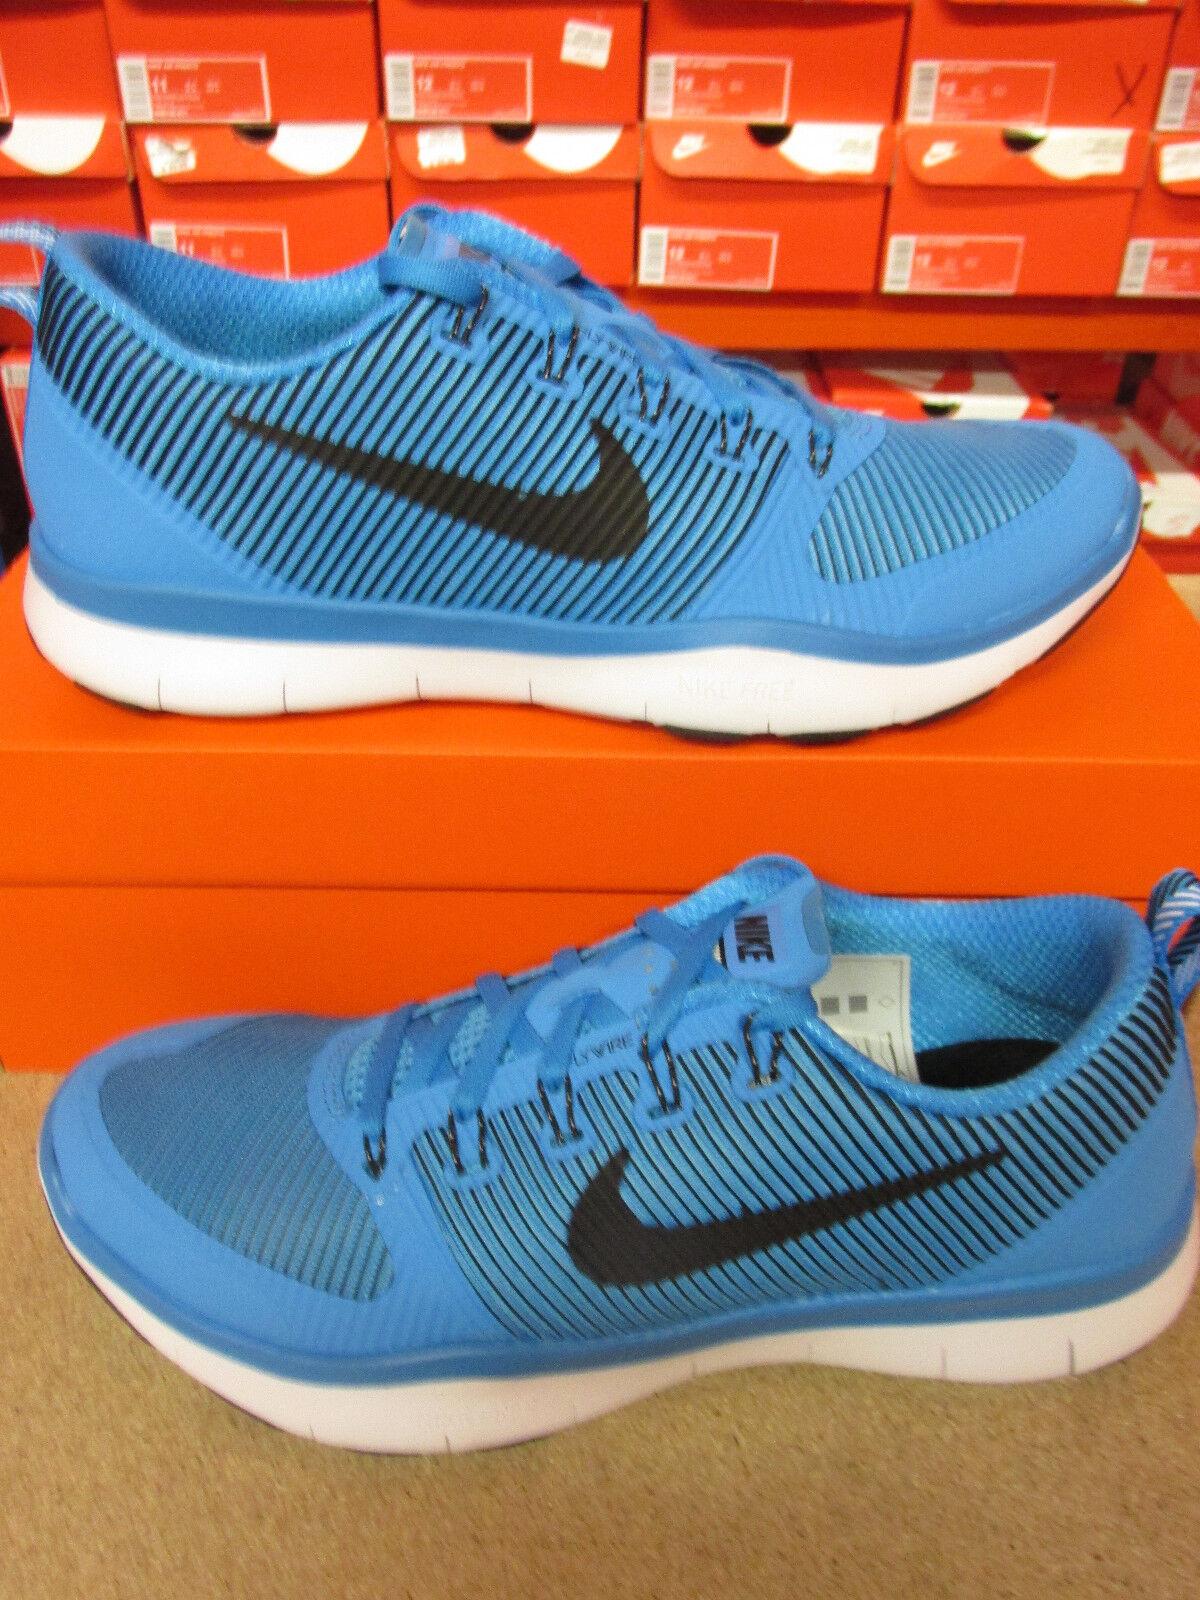 Nike Free Train Versatility Uomo Running Trainers 833258 401  Shoes